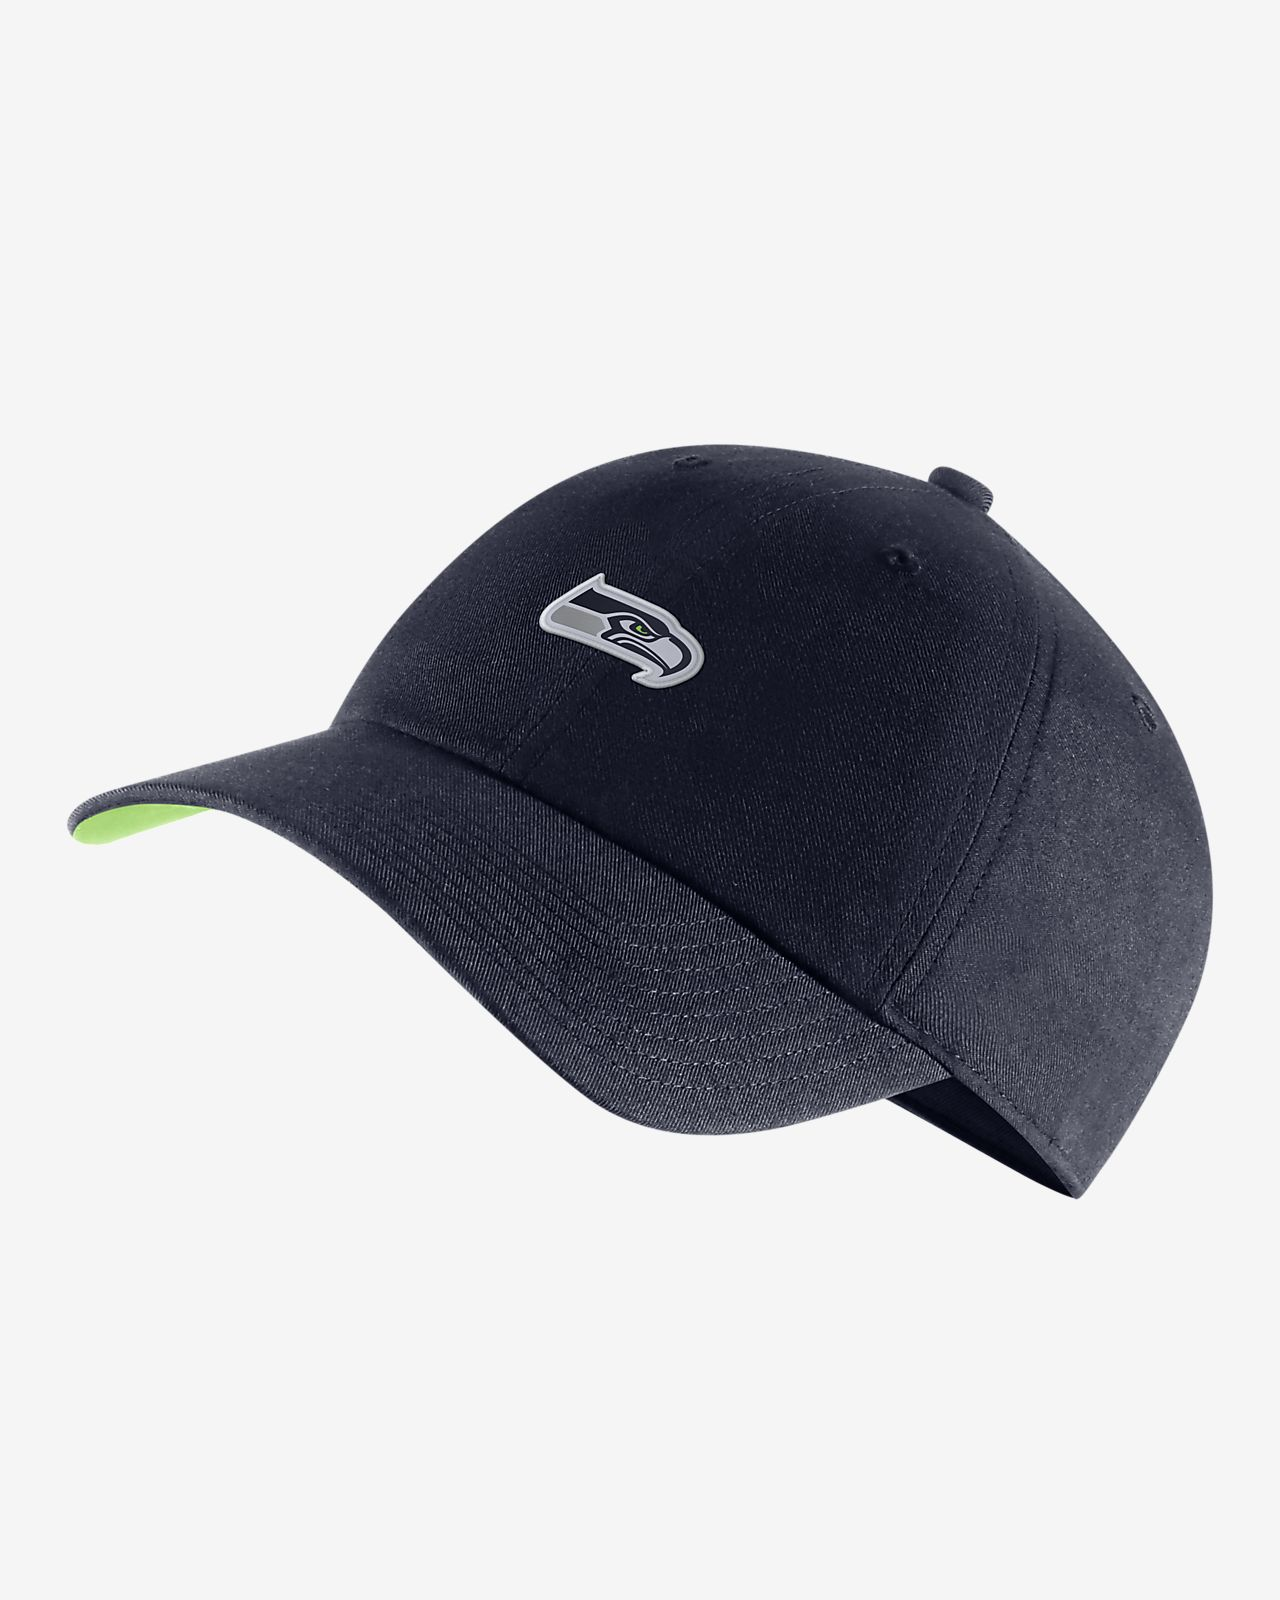 new product 2fa78 e1d62 ... Casquette réglable Nike Heritage86 (NFL Seahawks)